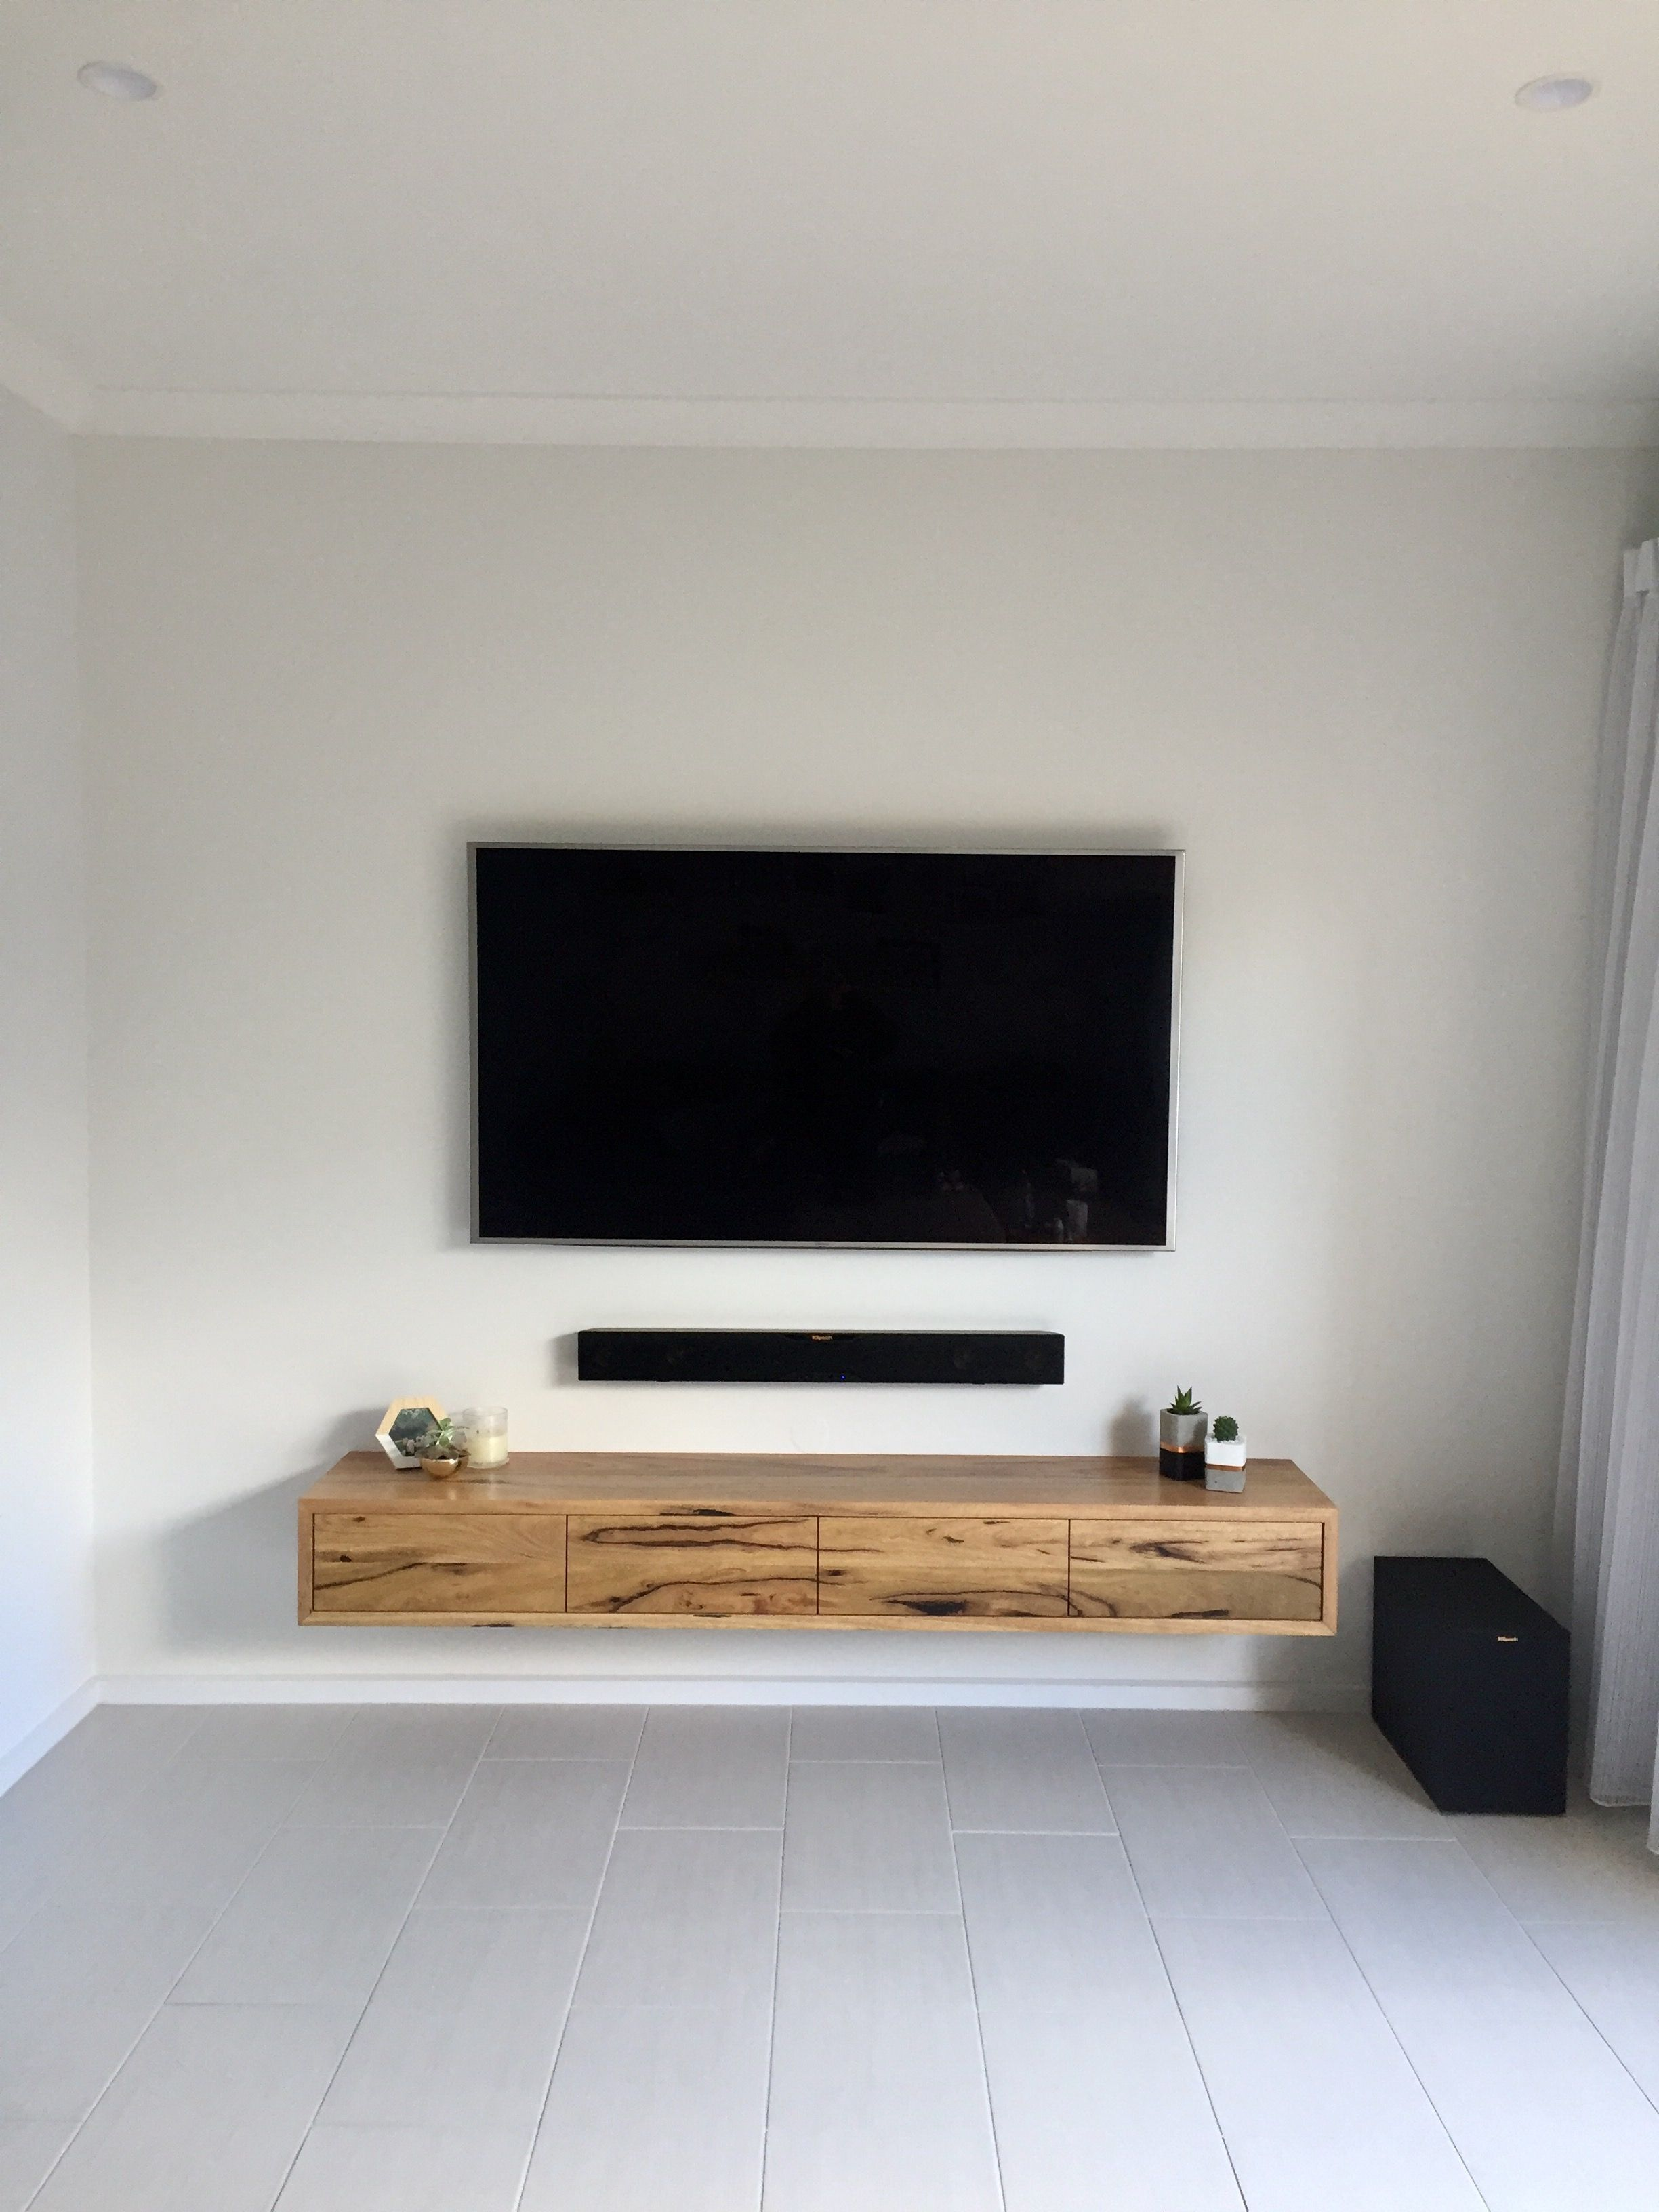 Tv Hall Cabinet Living Room Furniture Designs Wooden Tv: Living Room Tv Wall, Floating